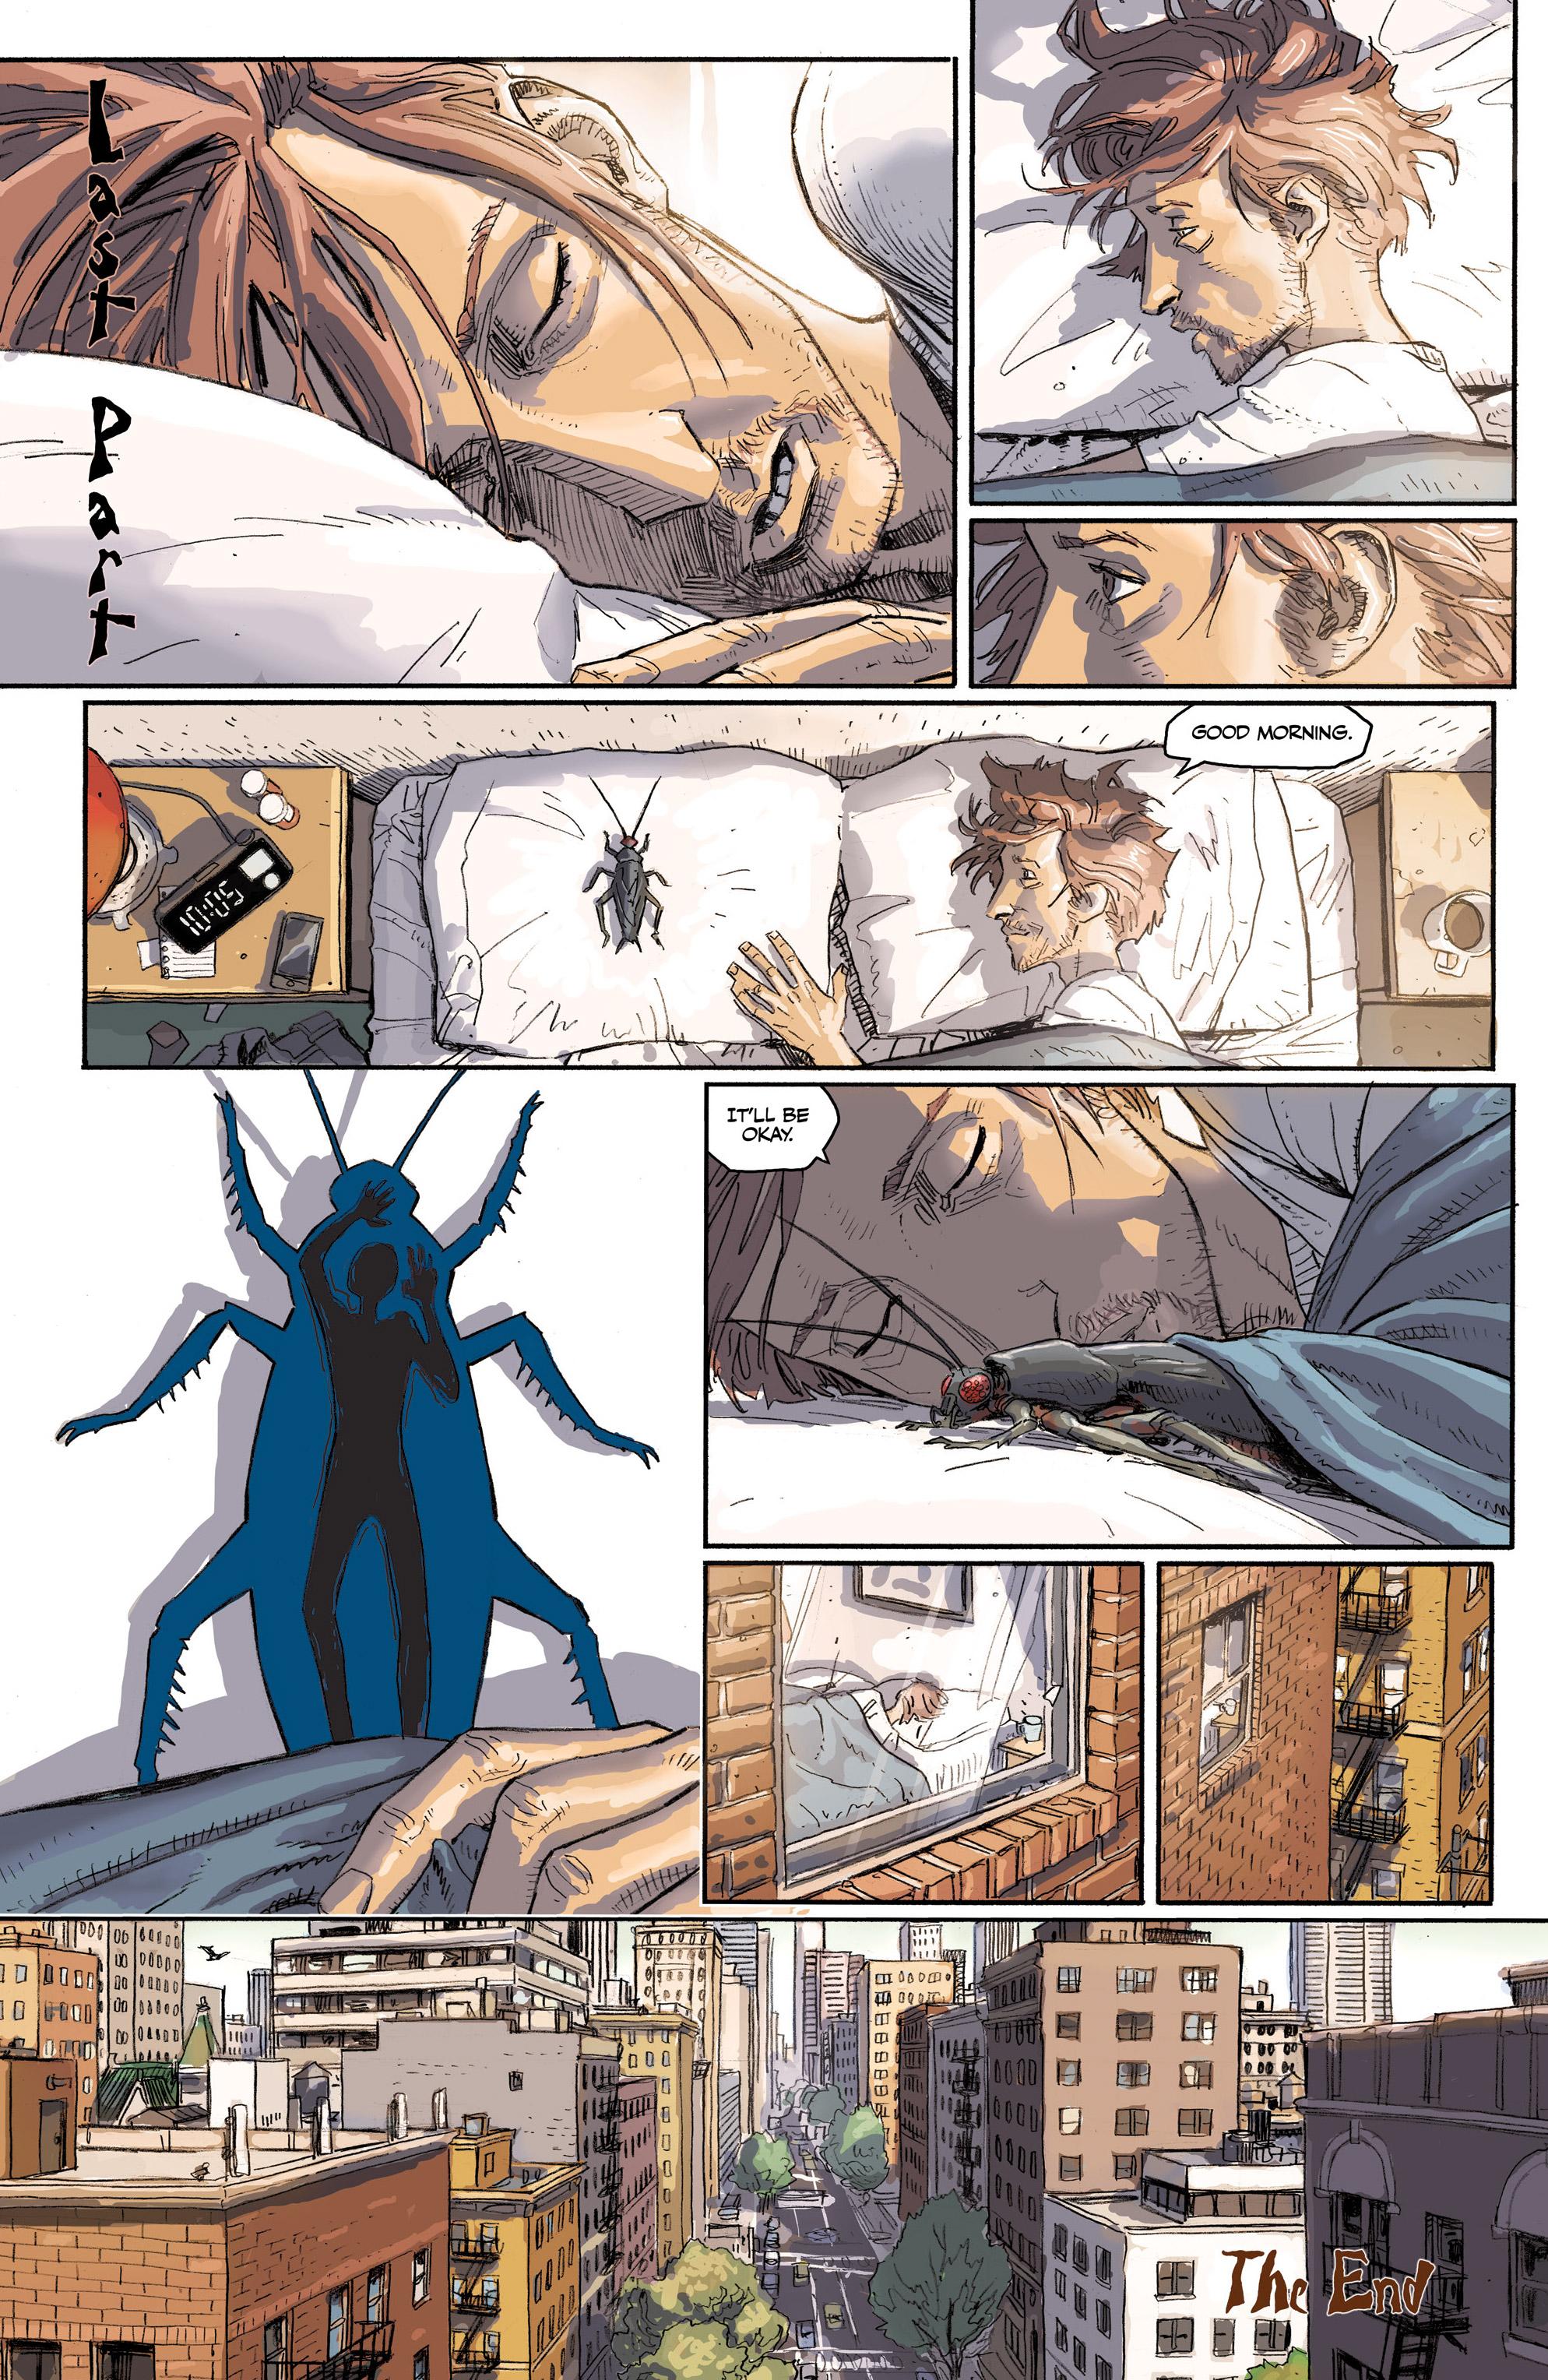 Read online Paklis comic -  Issue #1 - 21